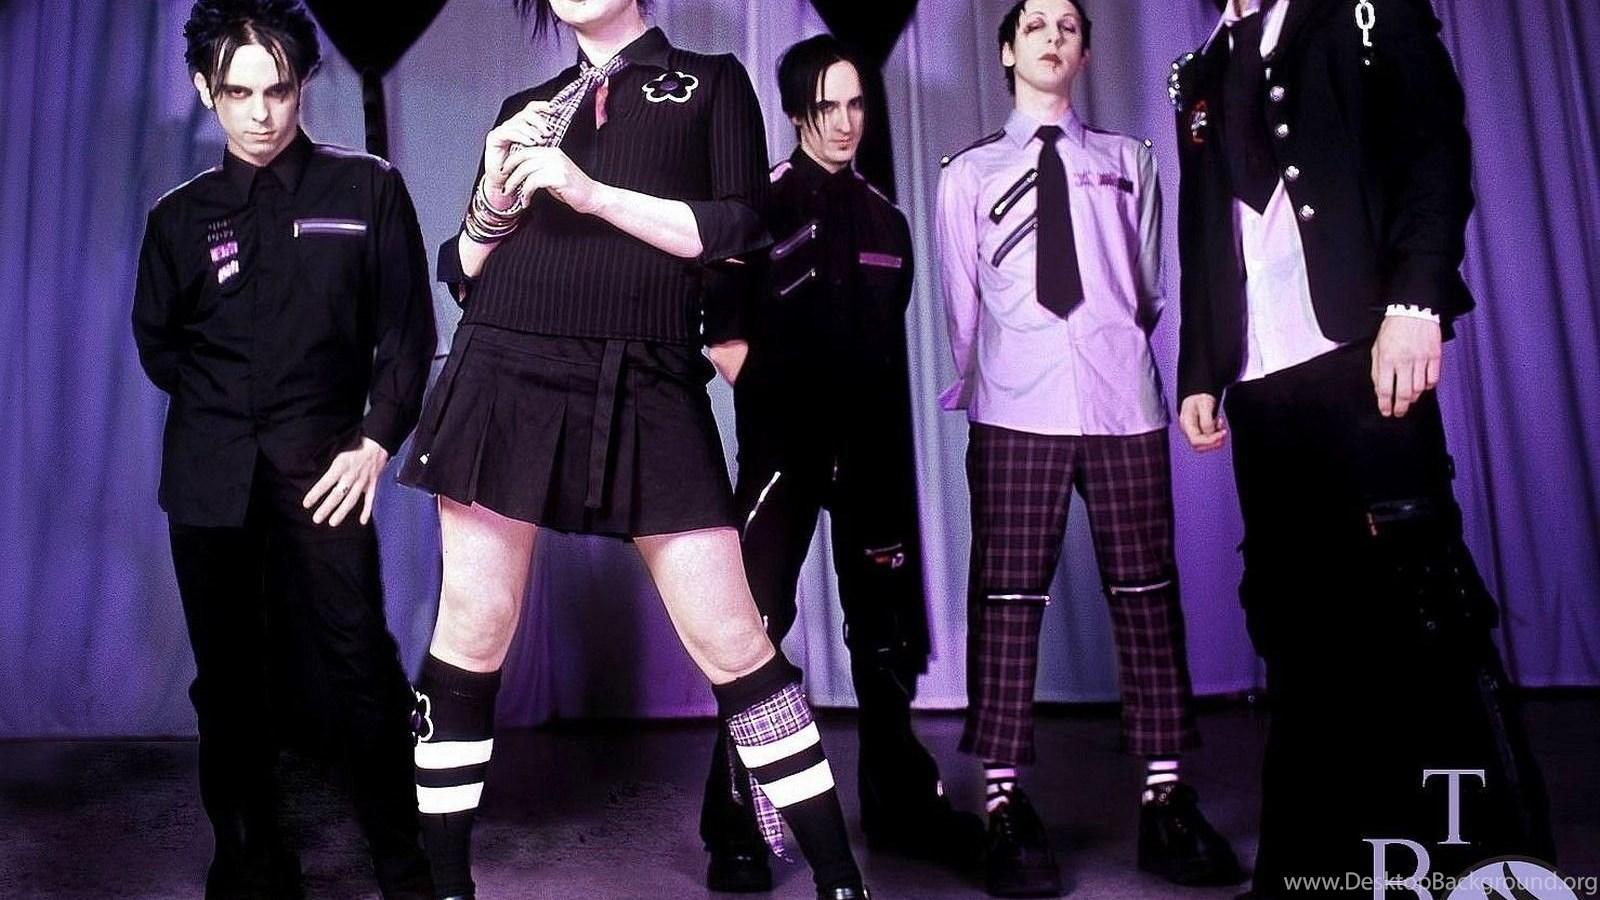 Dark gothic the birthday massacre industrial music wallpapers popular voltagebd Images